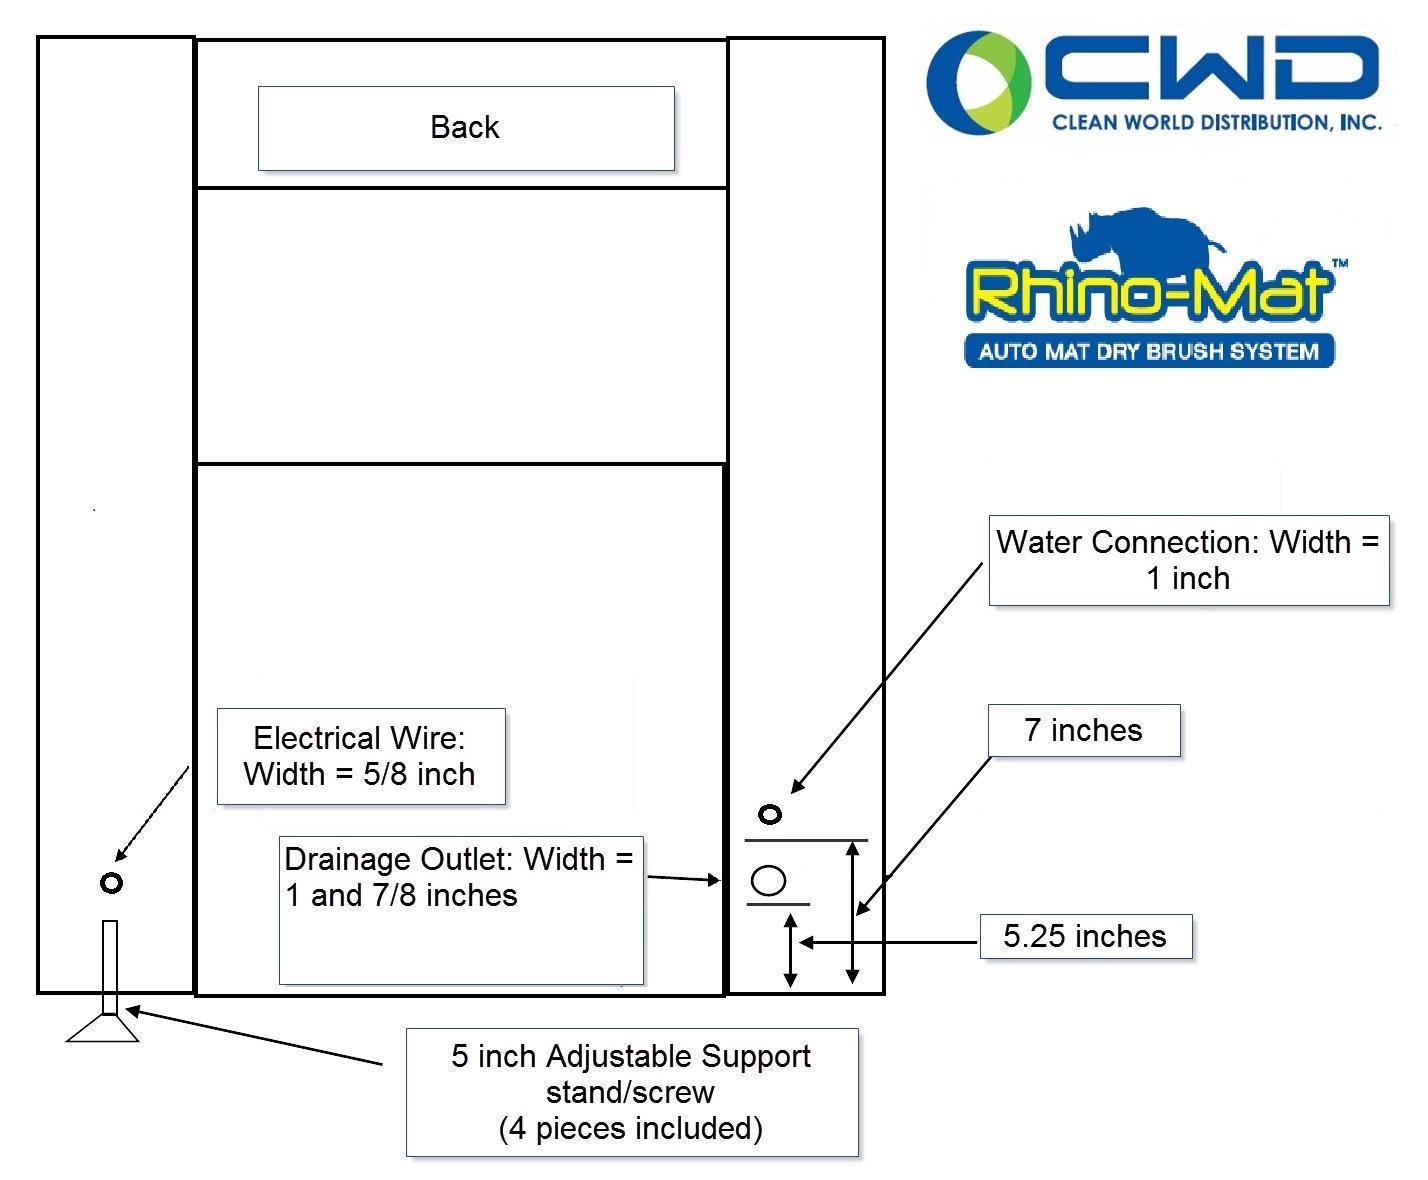 Tommy Rhino Mat Cleaner Semi Automatic Washing Machine Wiring Diagram Installation